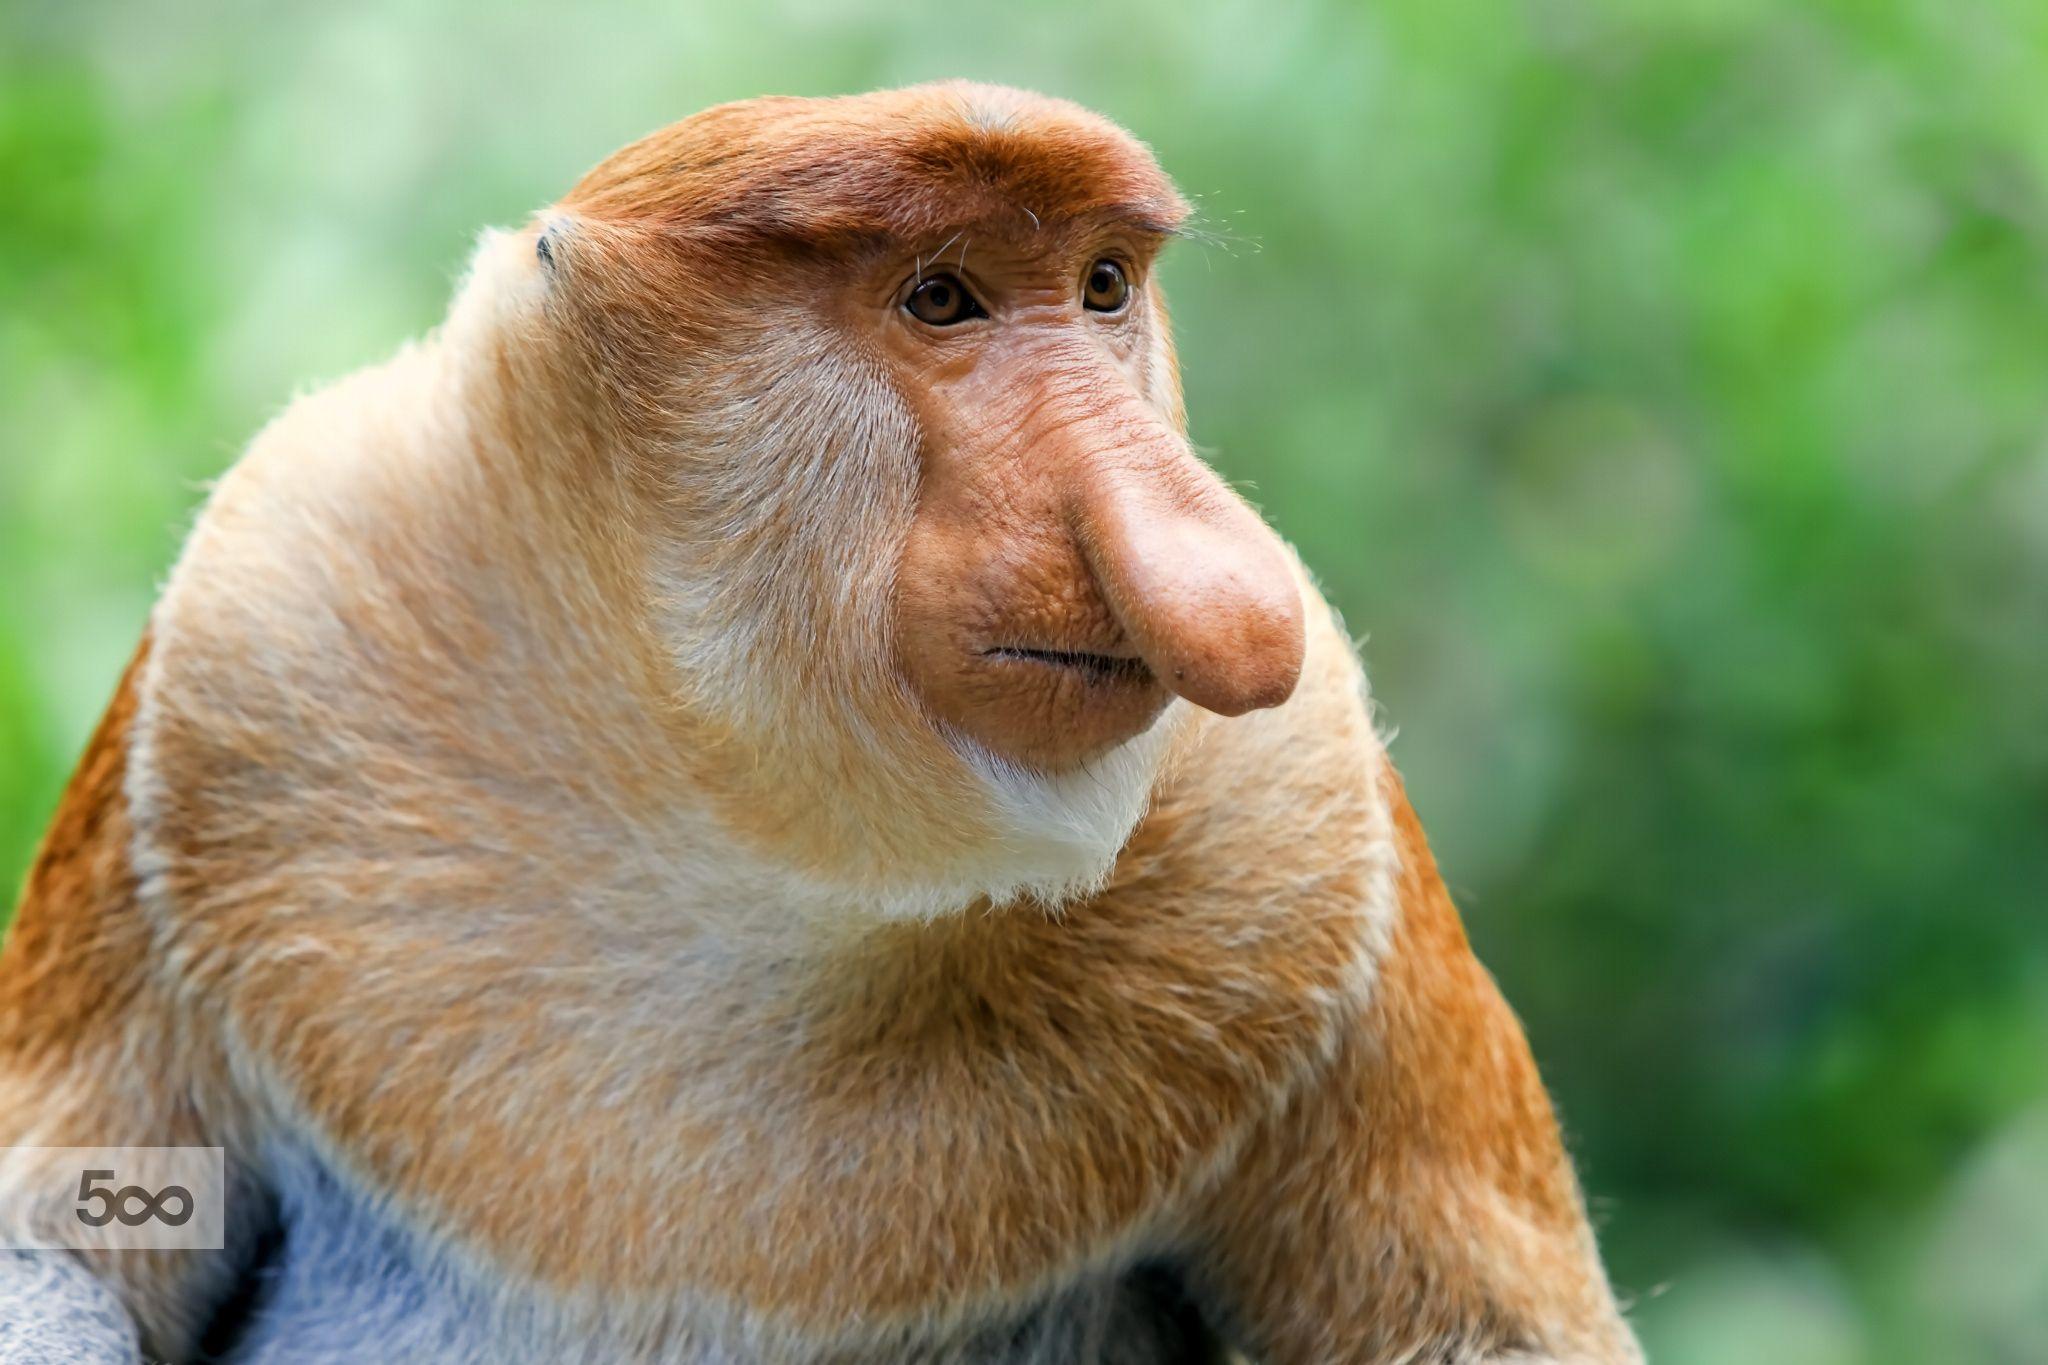 Proboscis monkey in the mangrove, Kota Kinabalu